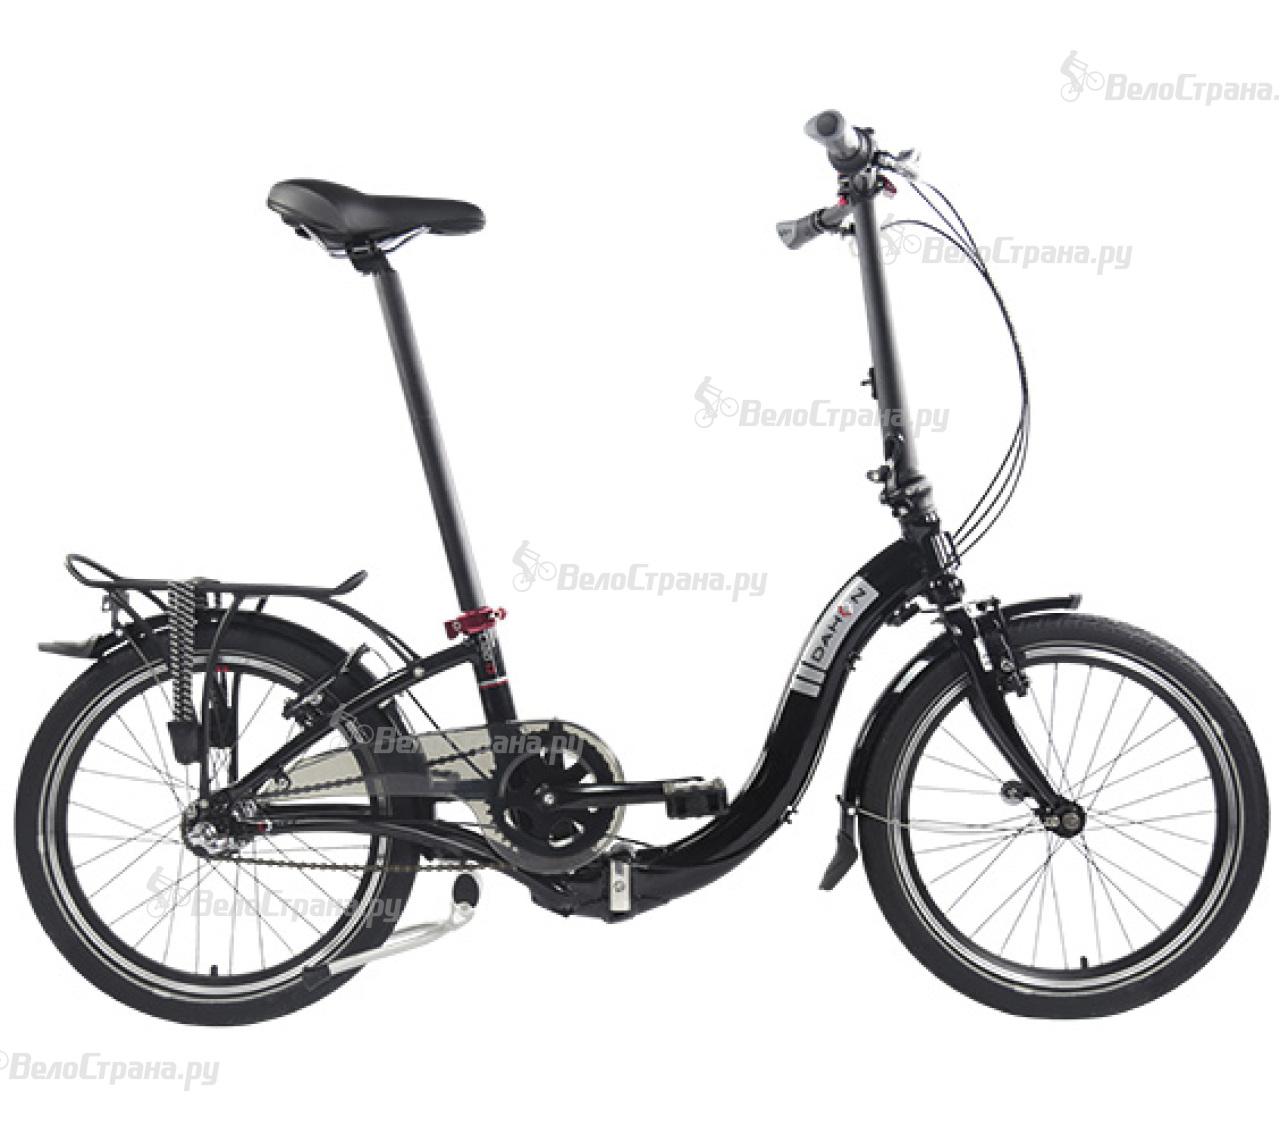 Велосипед Dahon Ciao i3 (2017) велосипед dahon ciao d7 2014